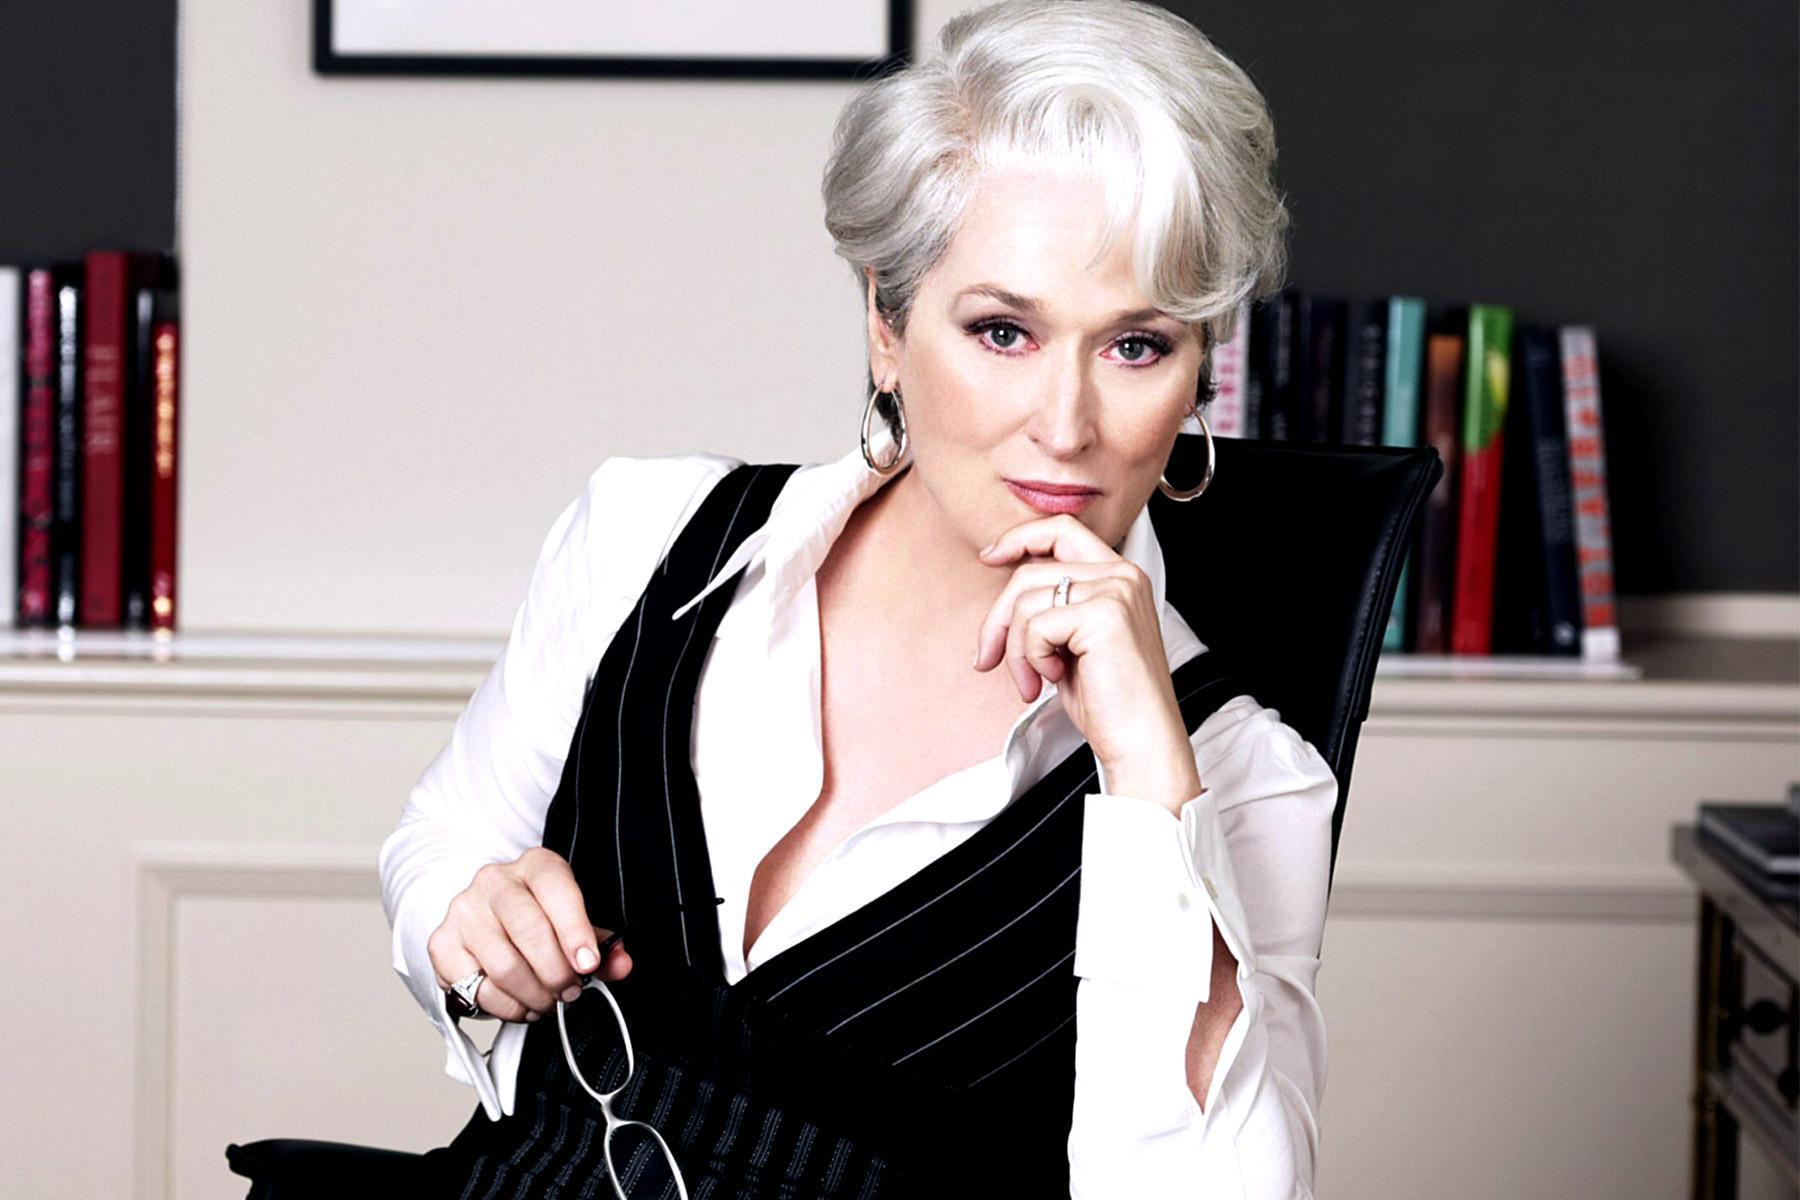 Meryl Streep in the movie The Devil Wears Prada